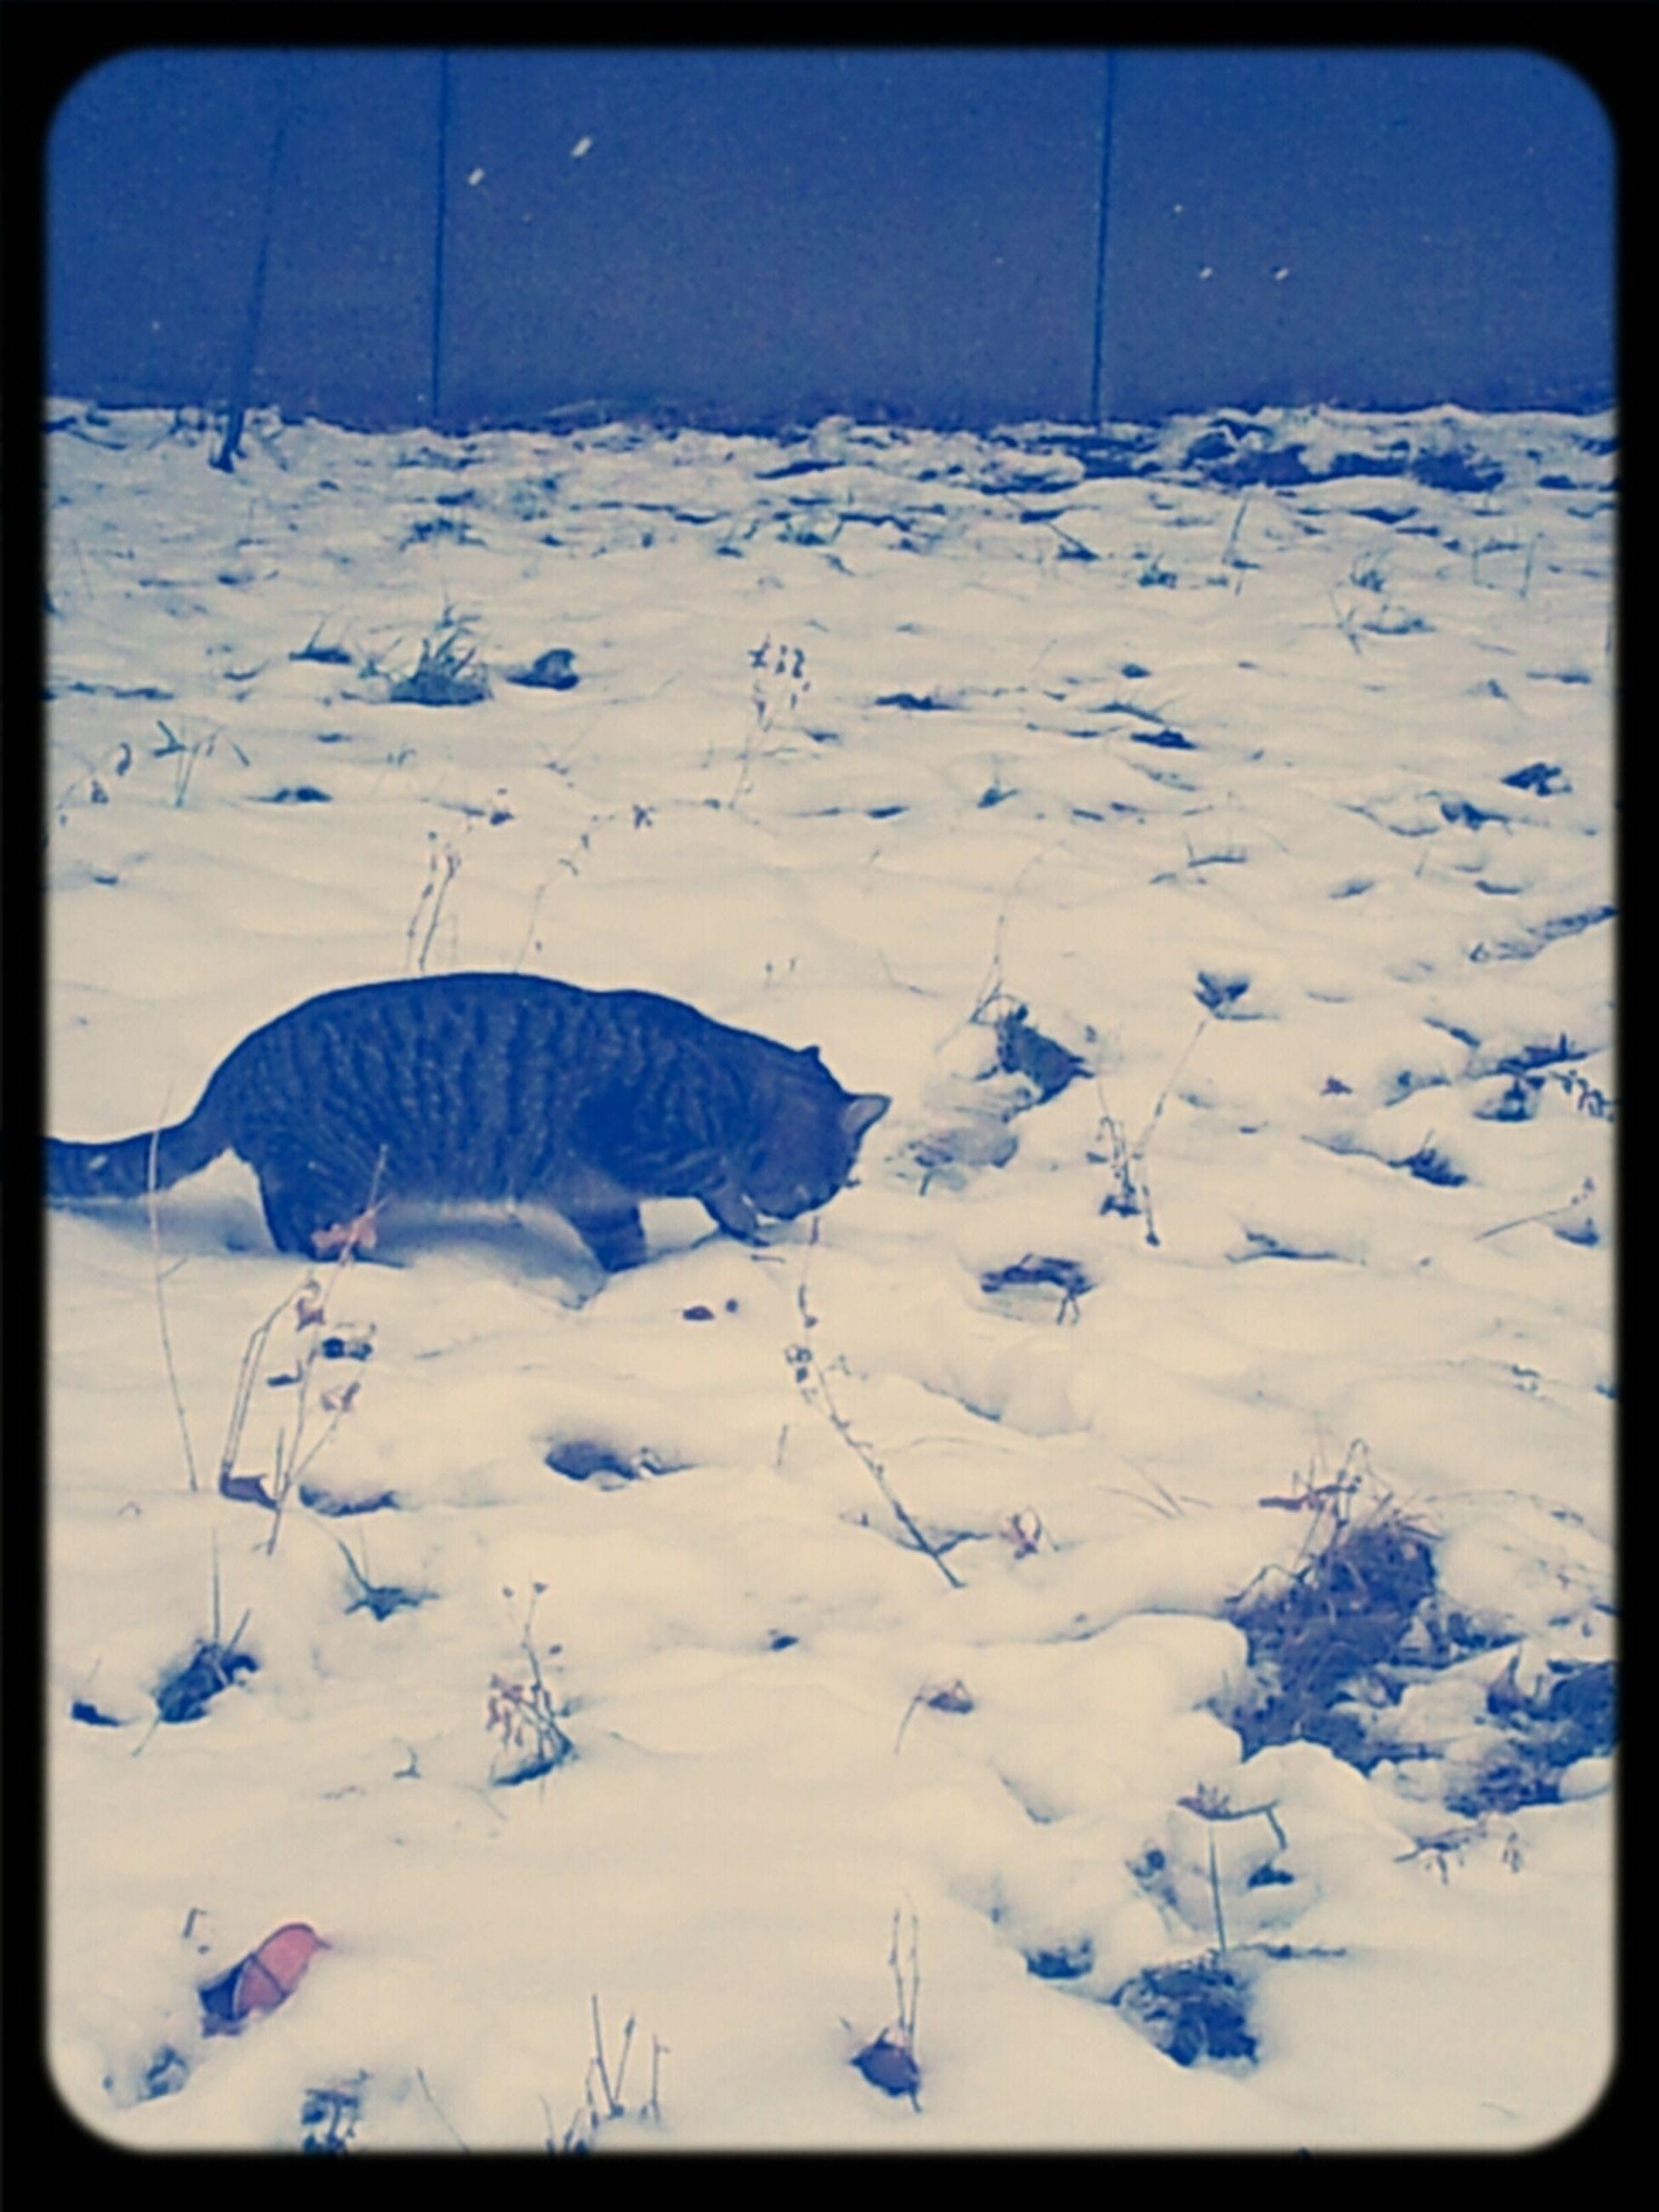 snow, winter, cold temperature, season, weather, covering, tranquil scene, tranquility, landscape, beauty in nature, scenics, white color, nature, snow covered, mountain, non-urban scene, transfer print, field, frozen, white